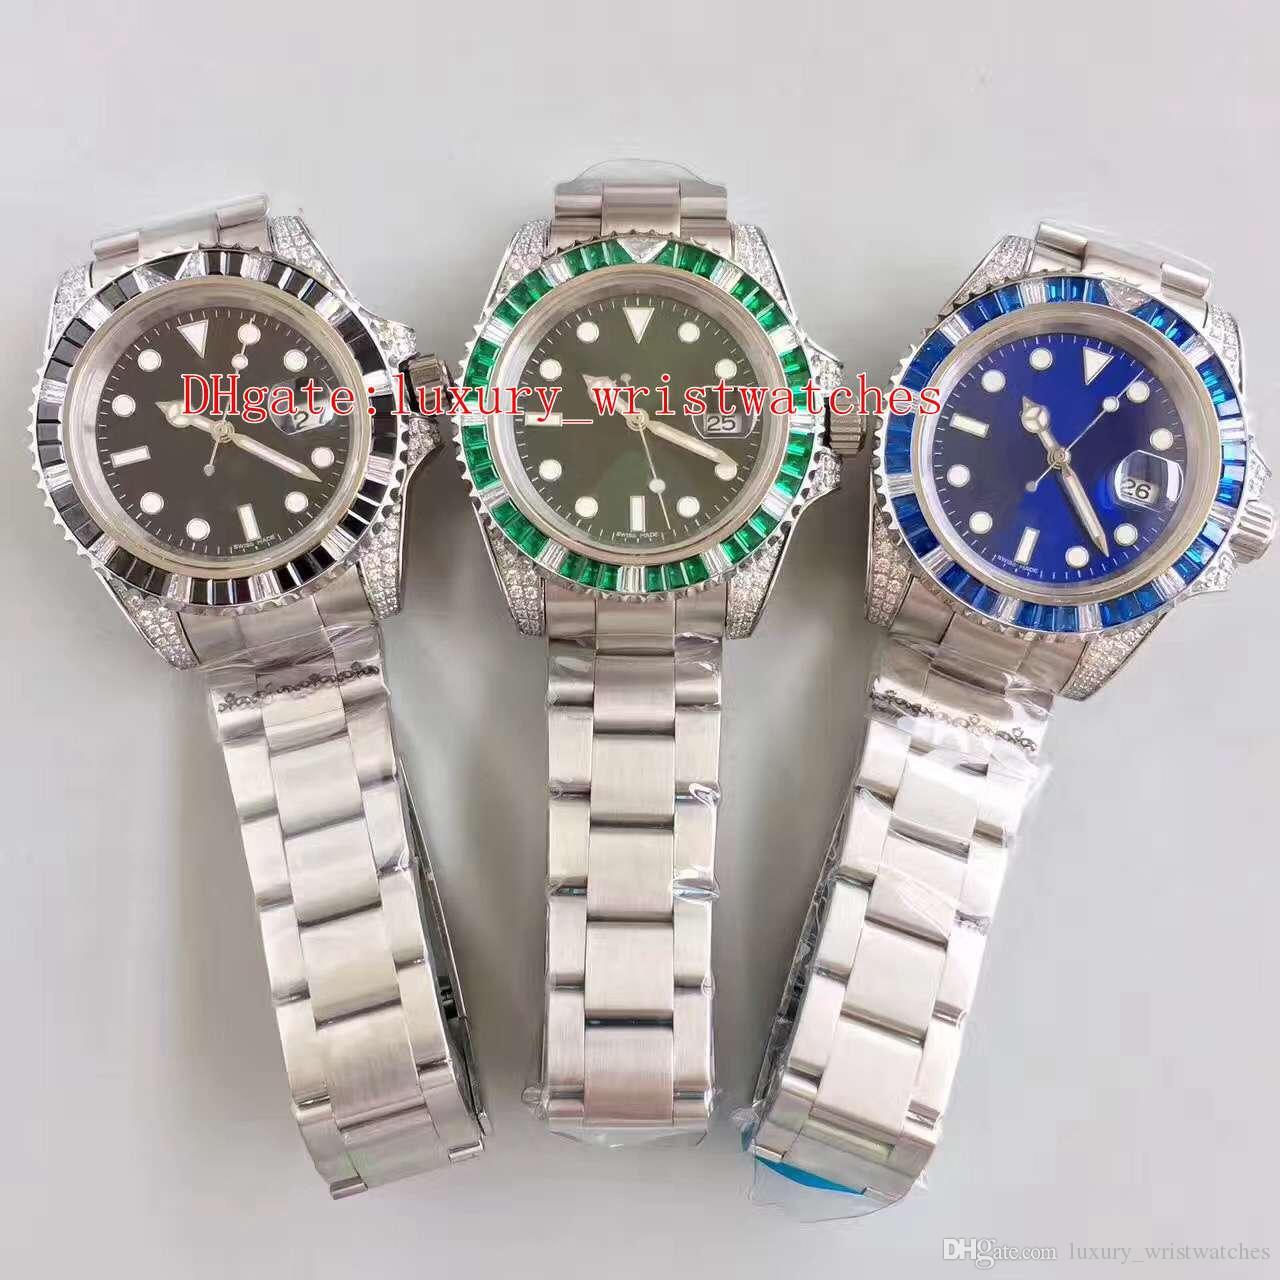 3 Farbe beste Qualität N-Fabrik V7 40mm Diamant-Lünette 116618 116610 116619 Edelstahl ETA 2836 Bewegung Automatik Herren-Uhr-Uhren